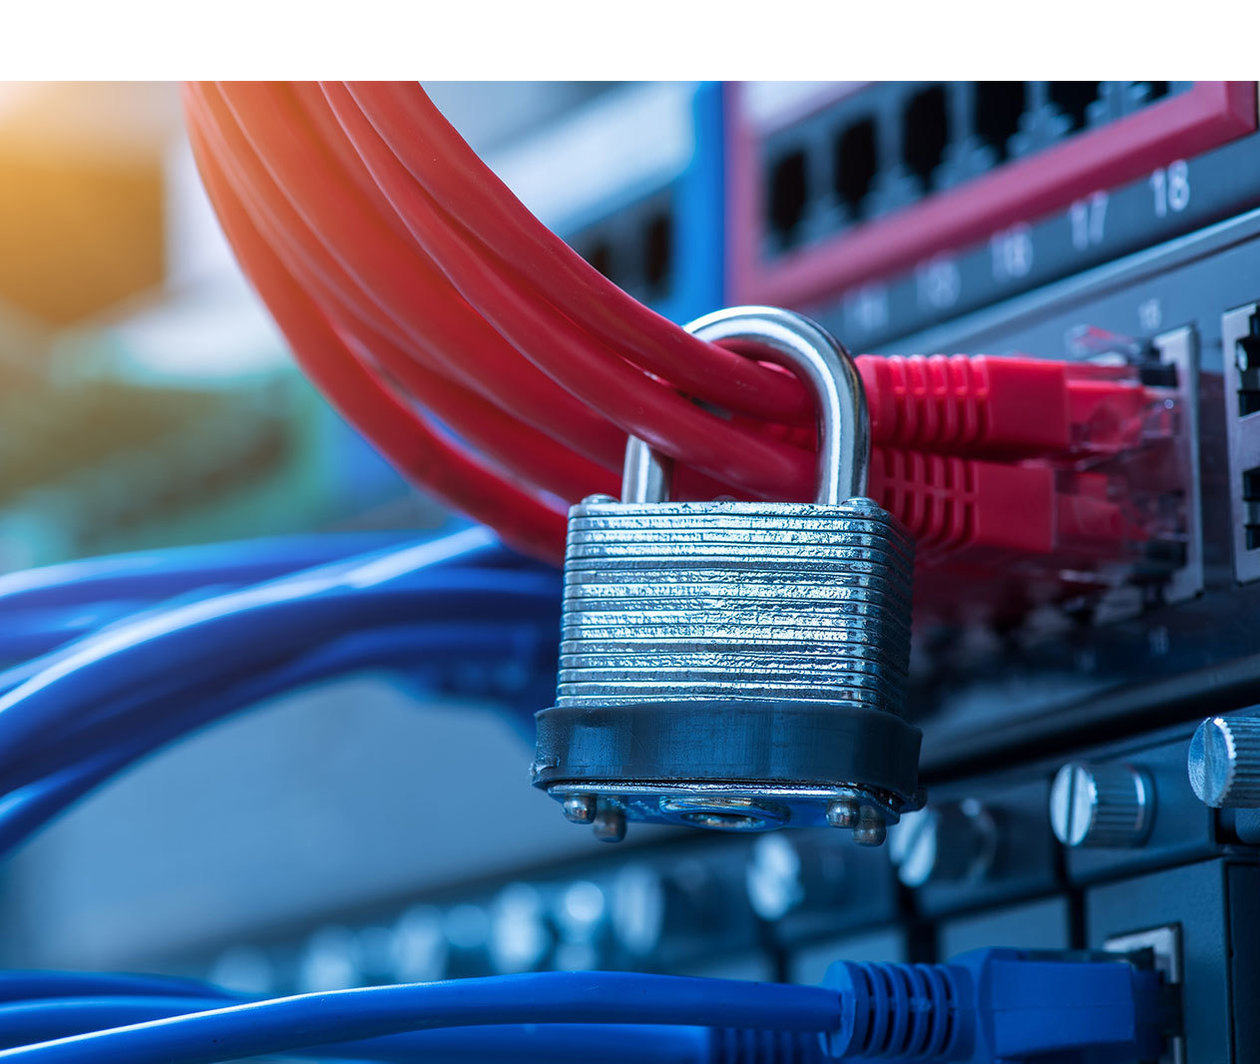 SIT719.4 Securing Data